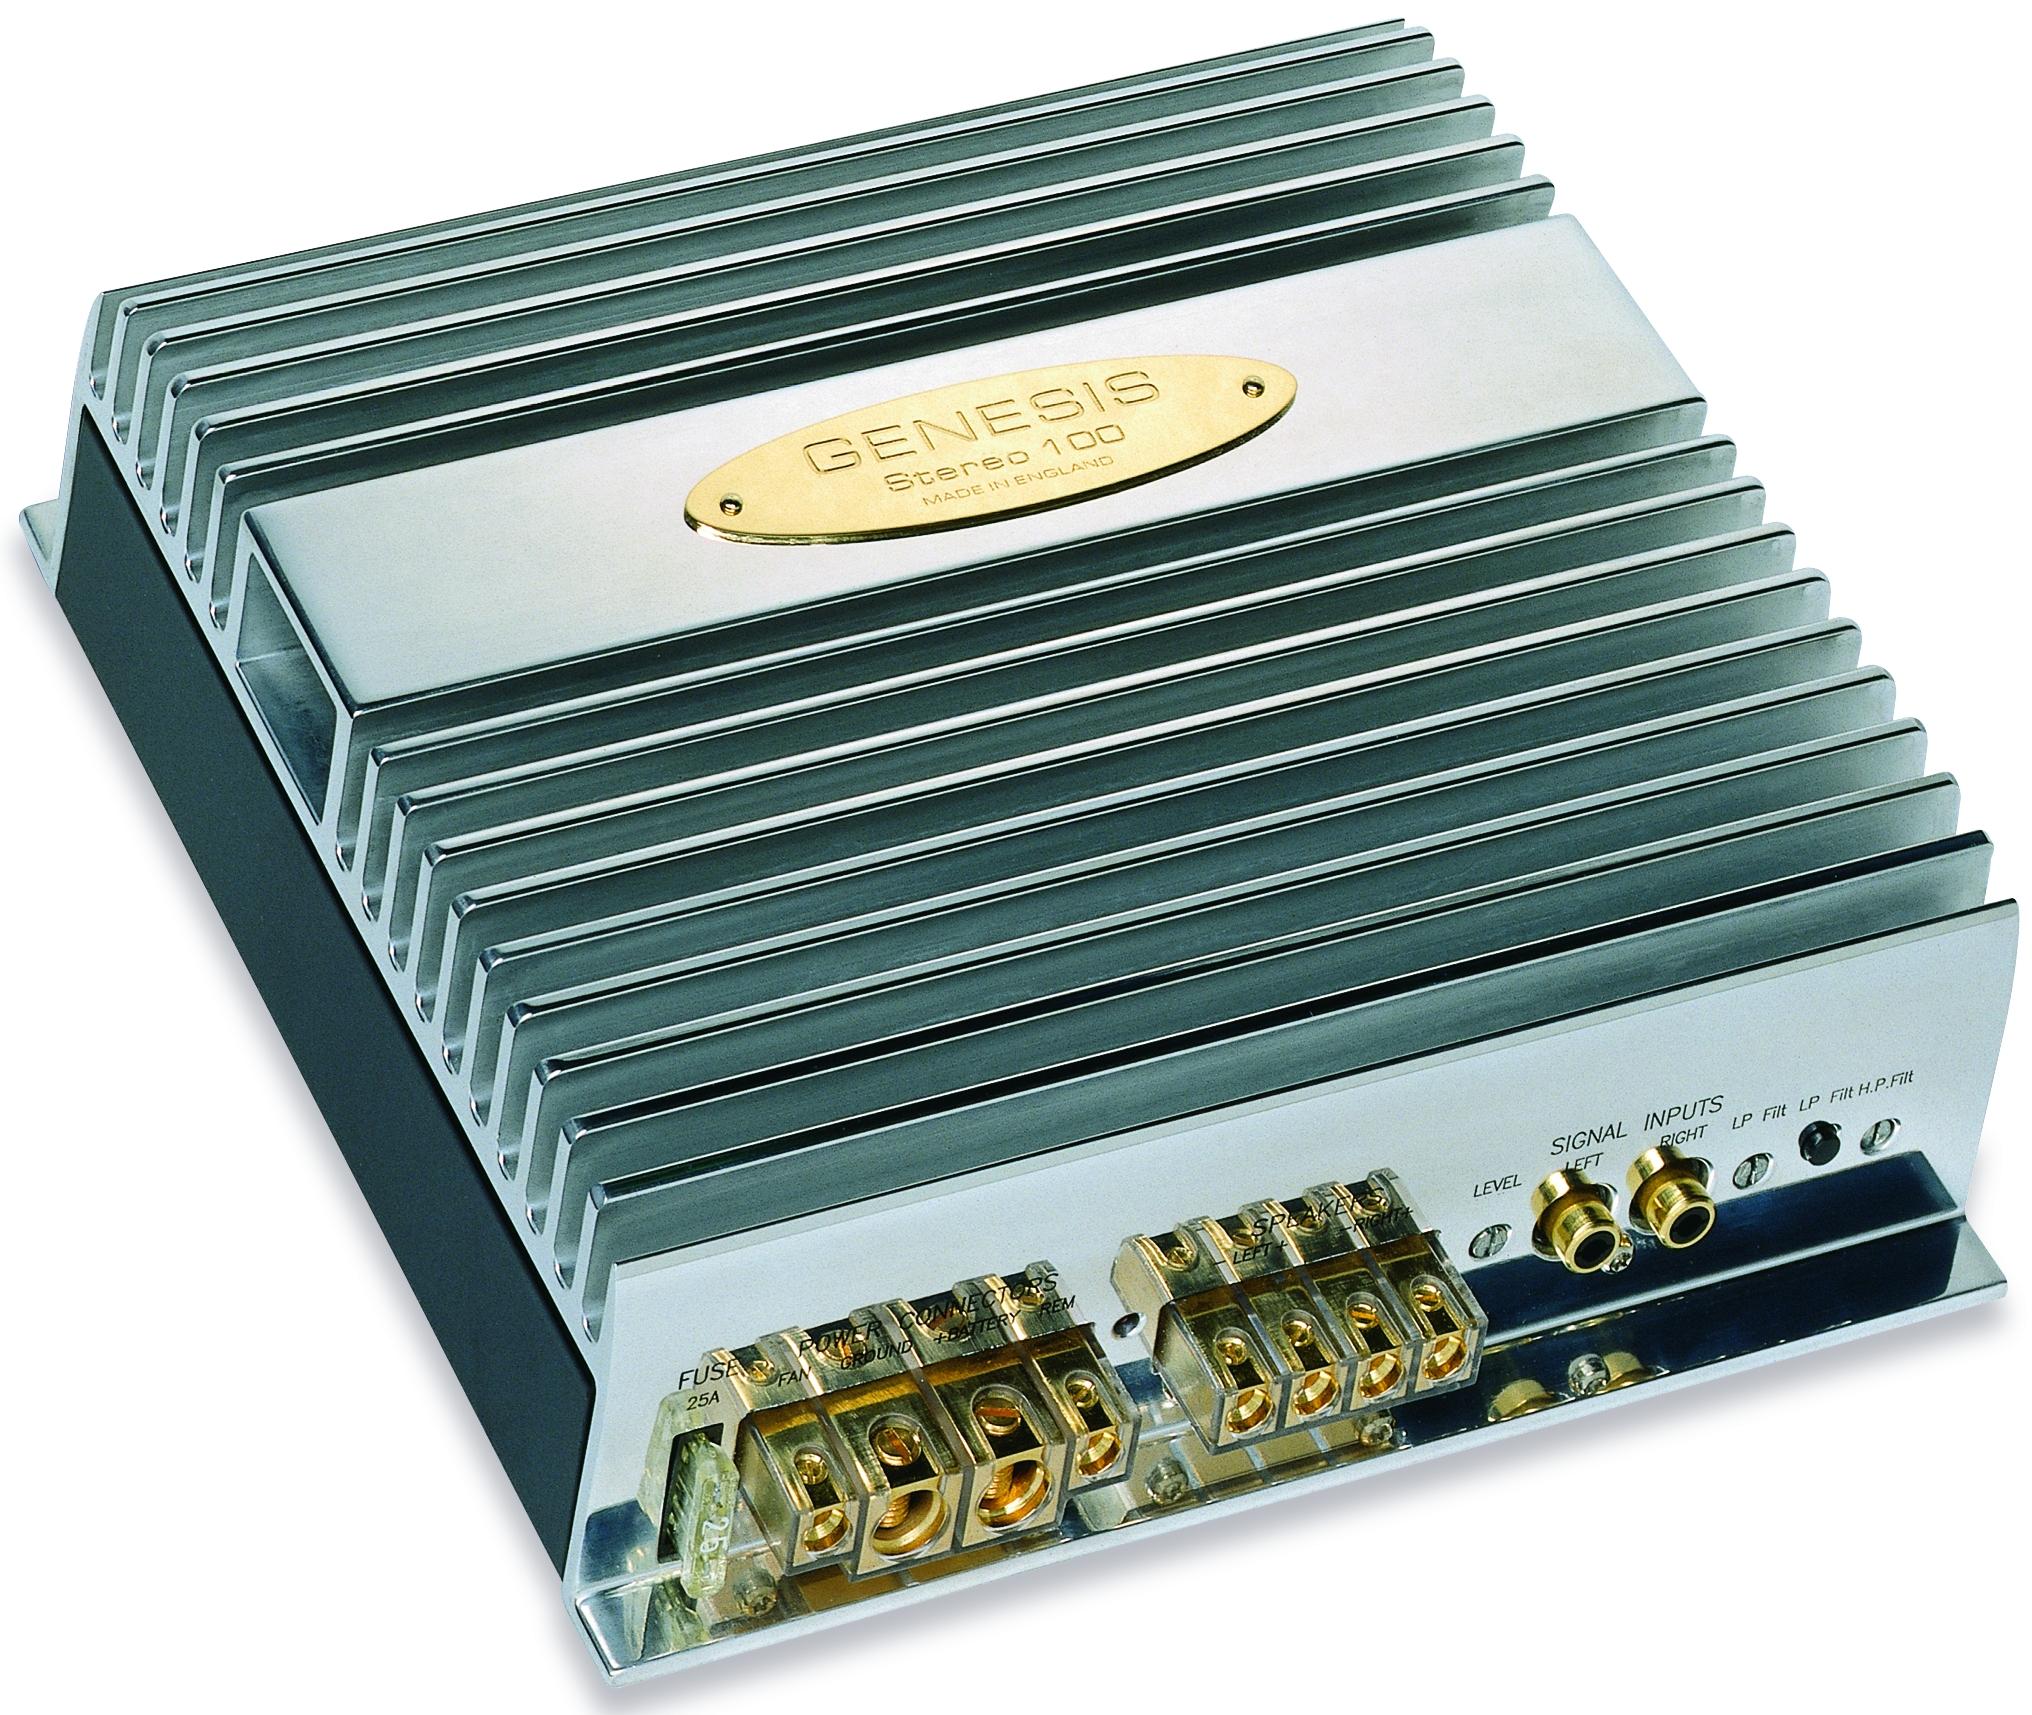 Zesilovač Genesis Stereo 100